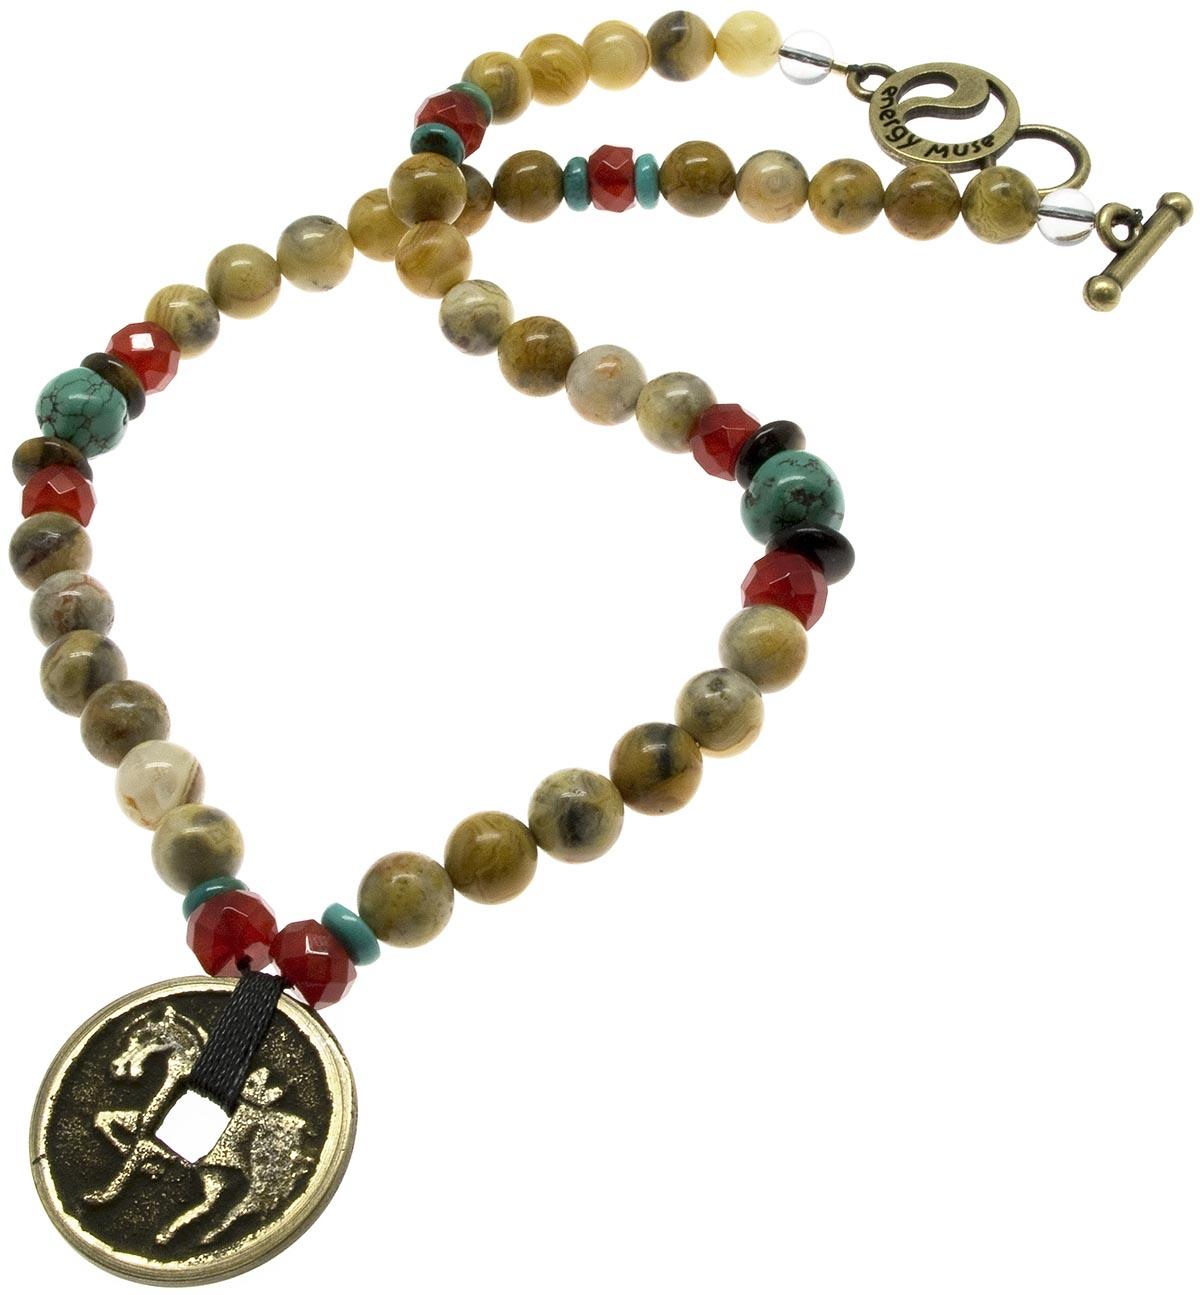 Spirit Gemstone   Coin Necklace - 20% OFF!-www.hoofprints.com 26db55d74e2